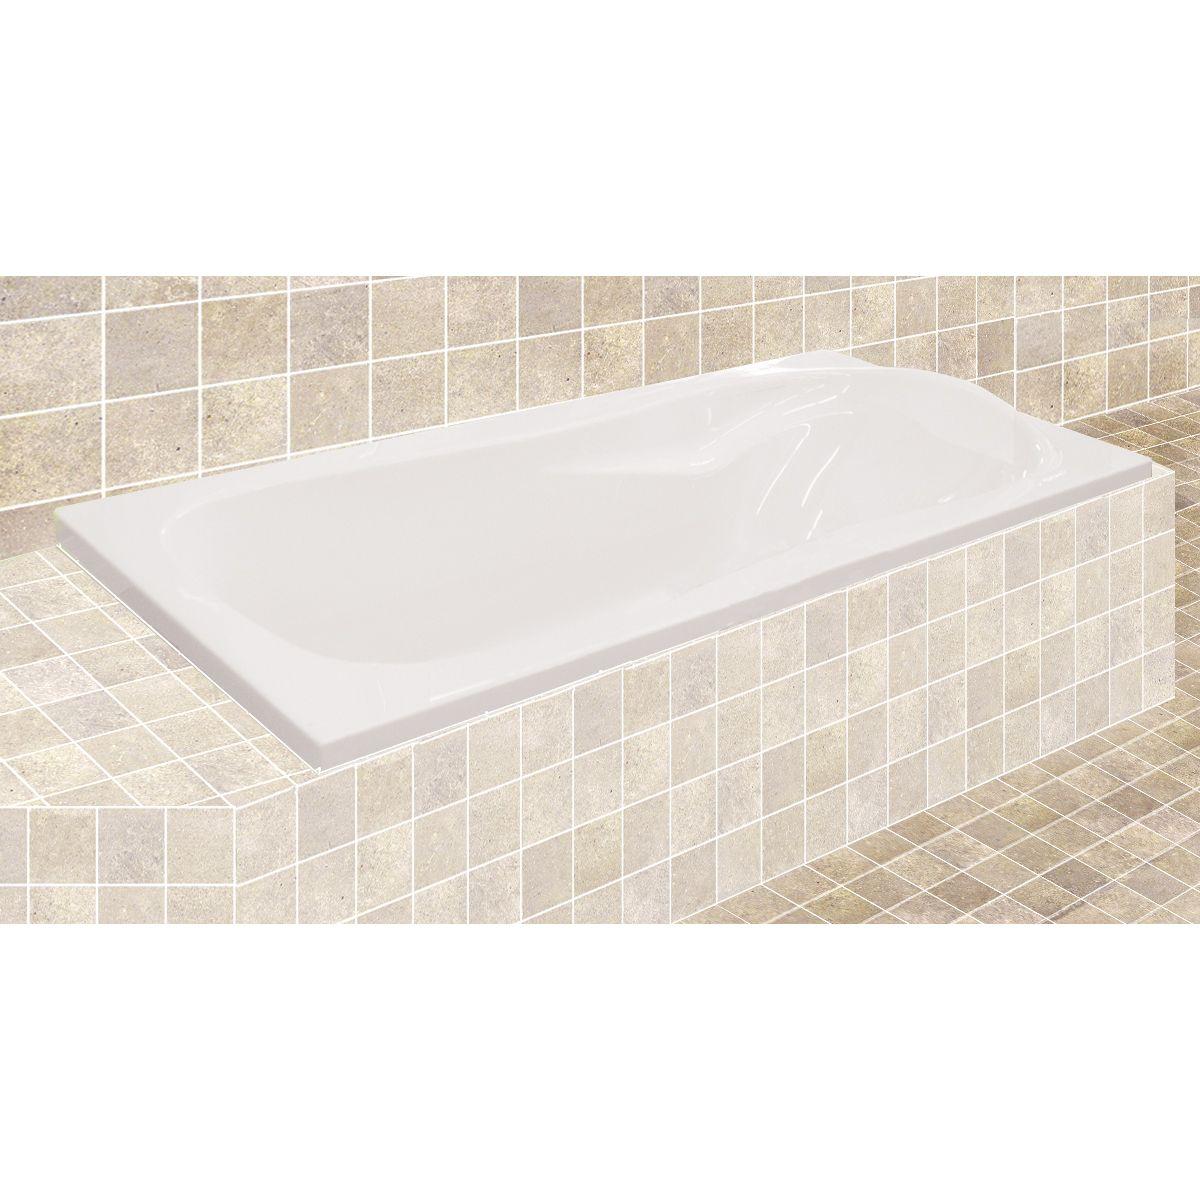 Jade Bath BLW1035 60 Signature Soho Drop In Tub   Loweu0027s Canada